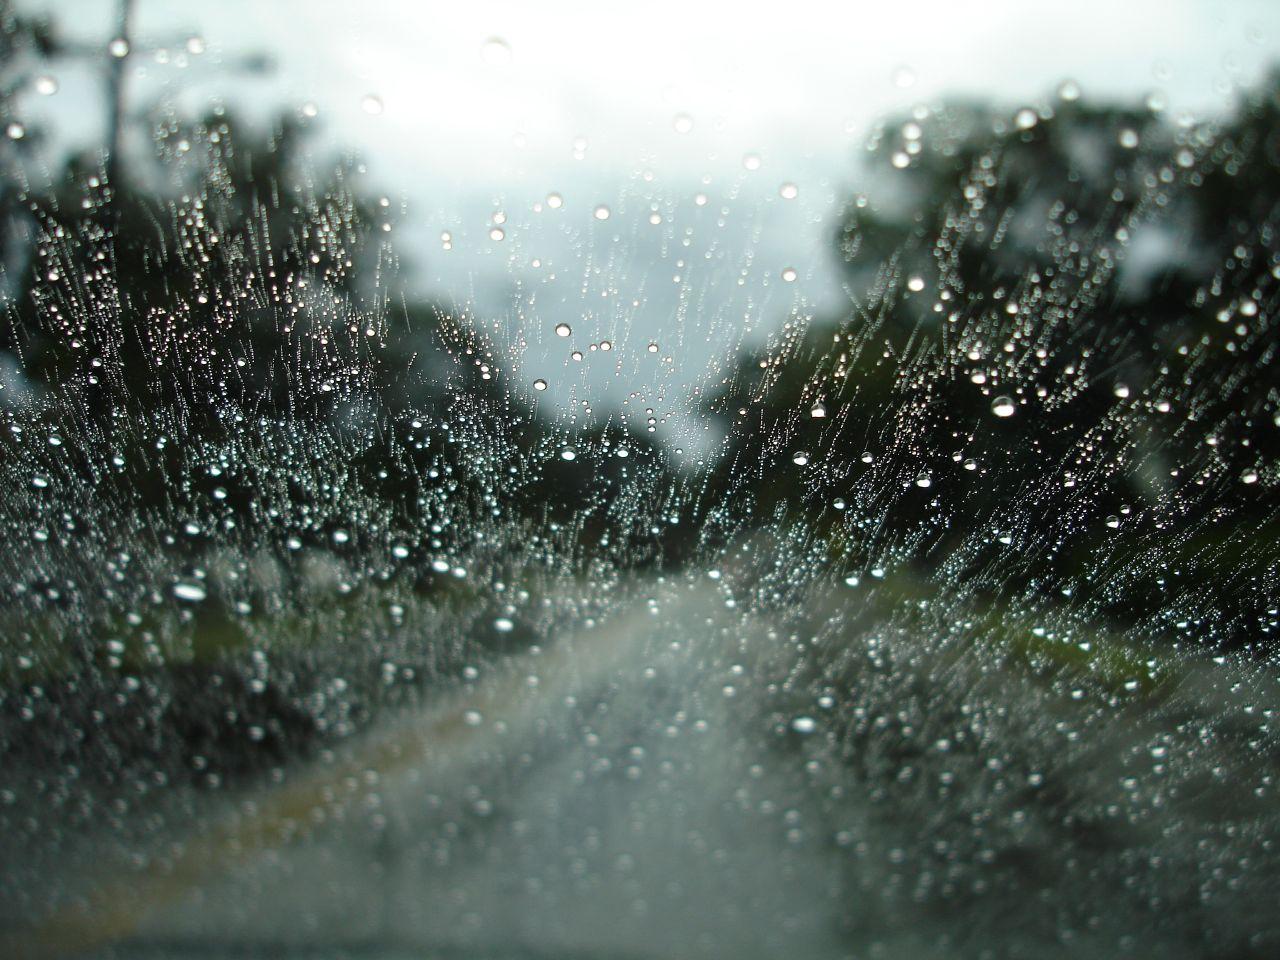 Rainy Wallpaper